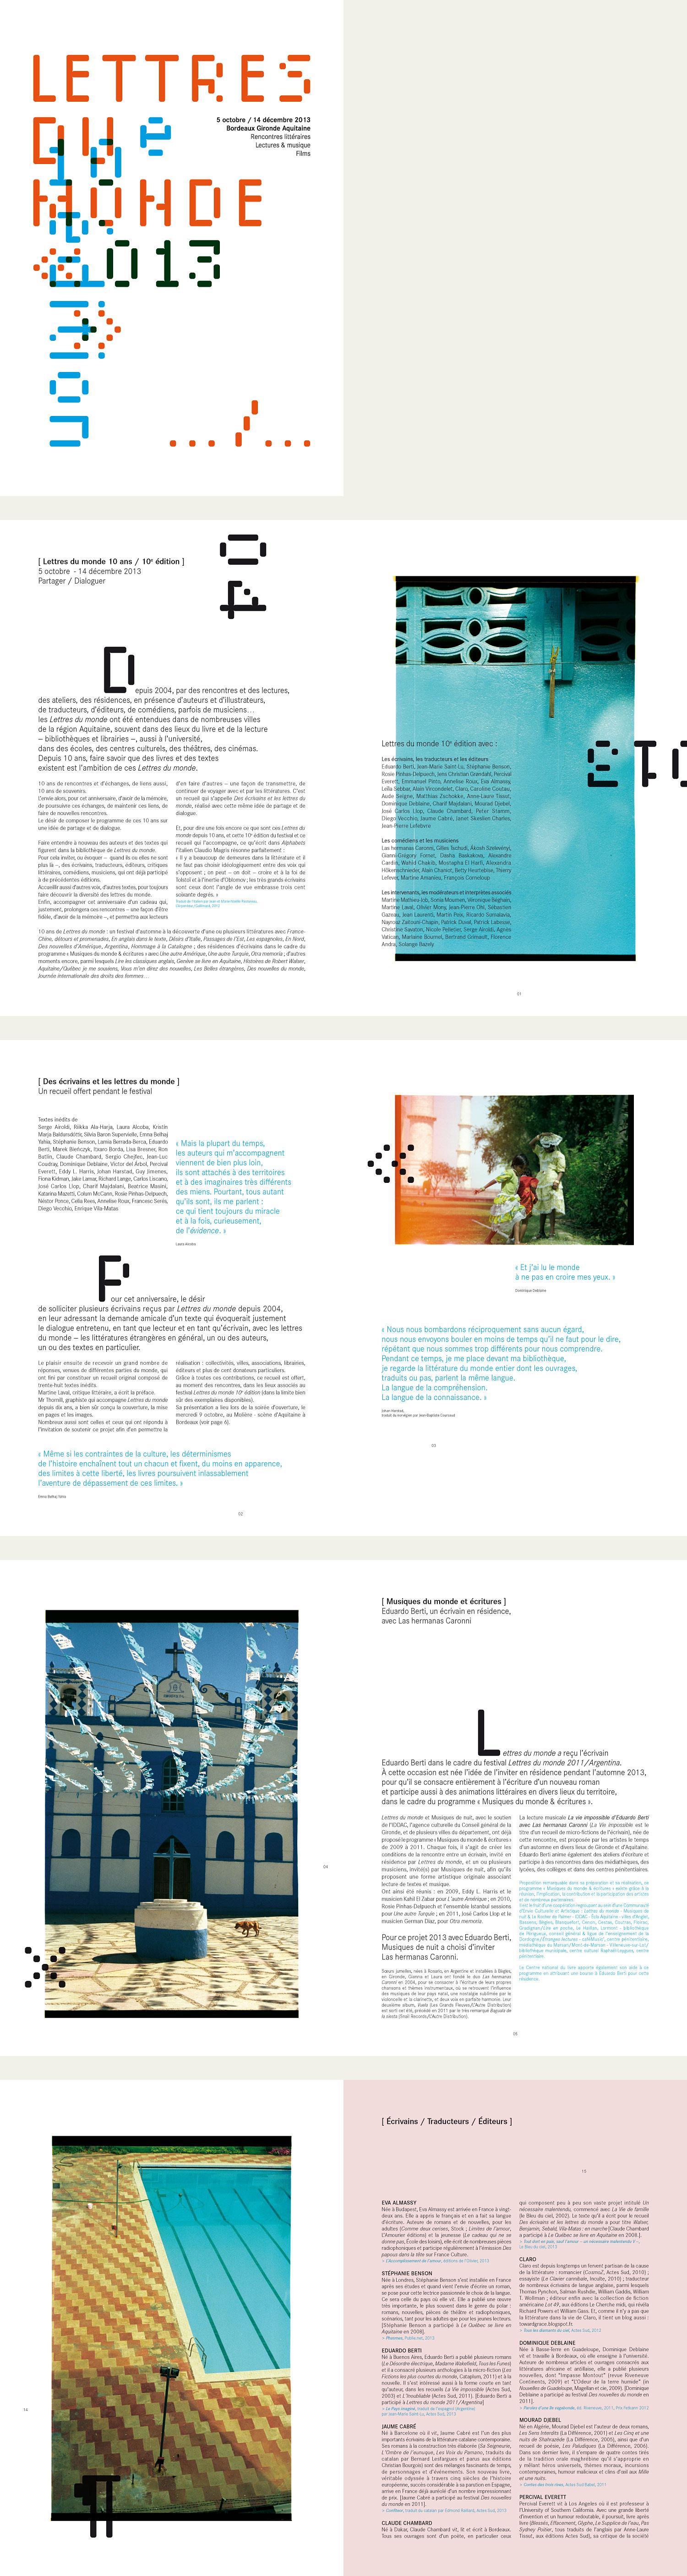 MrThornill-graphisme-lettres-du-monde-10eme-edition-2013-ph3